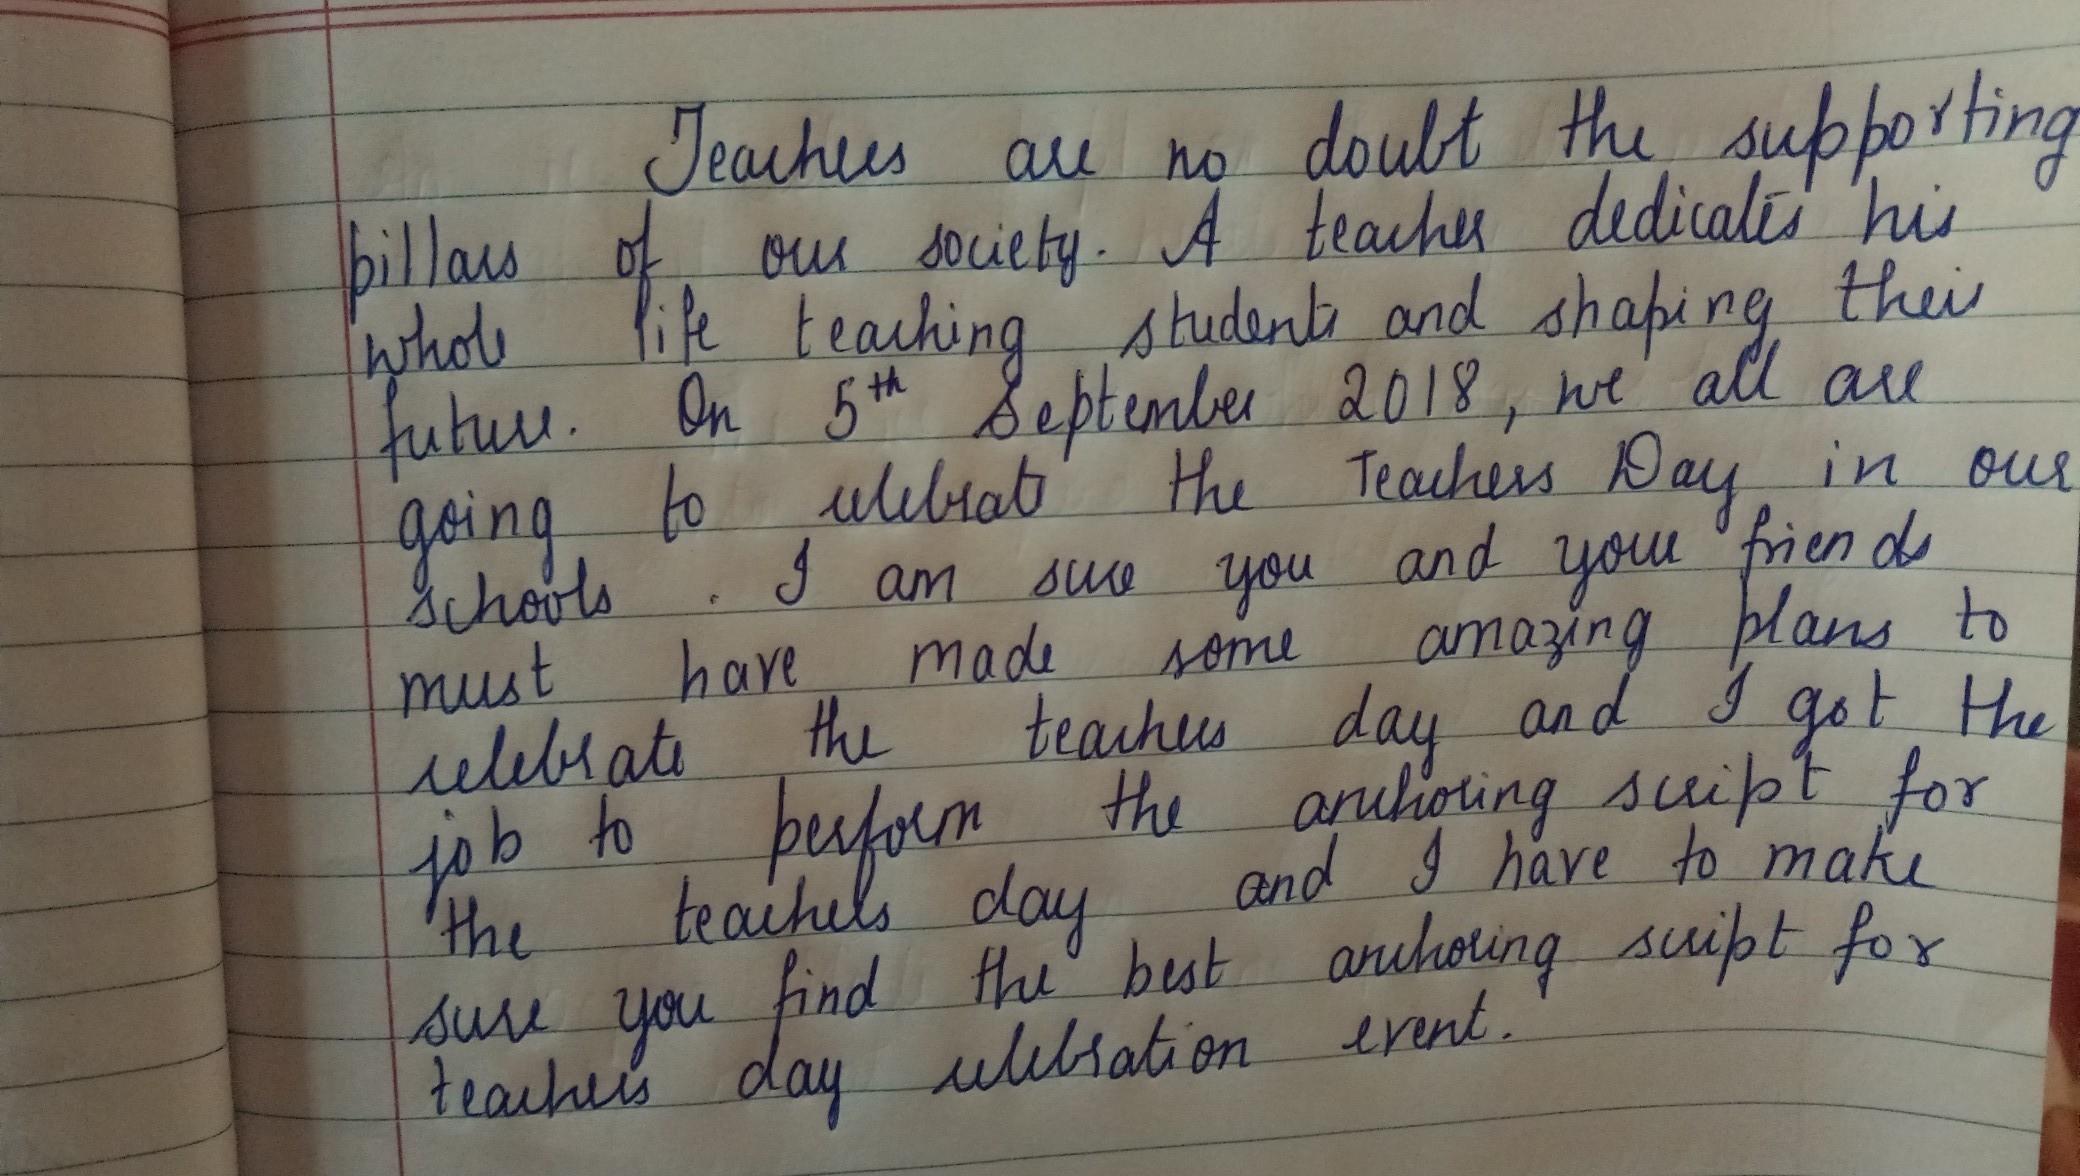 anchoring teachers day programme